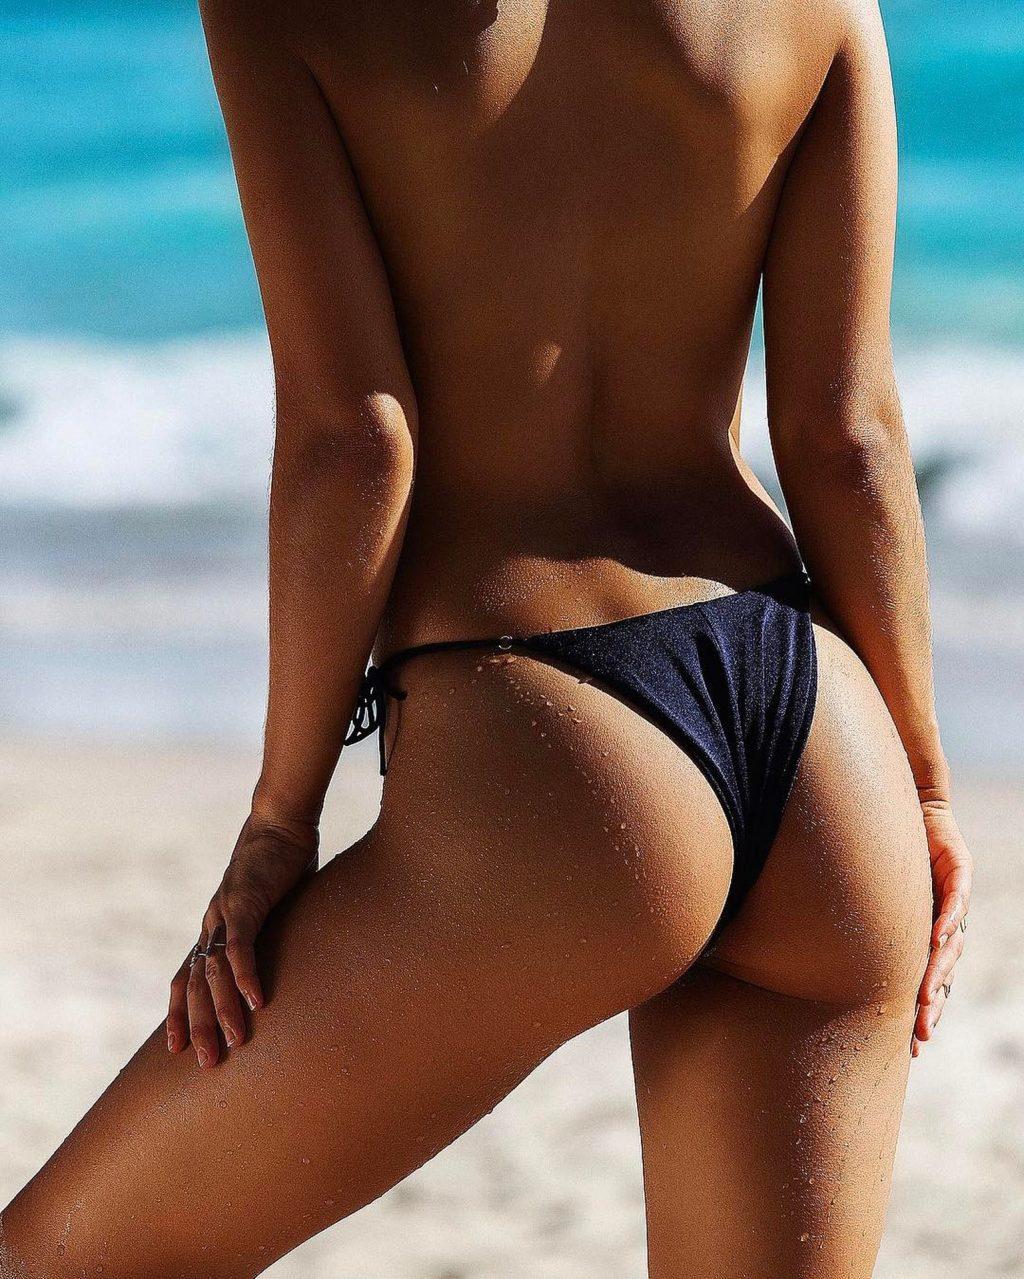 Brooklyn Kelly Nude & Sexy (16 Photos)